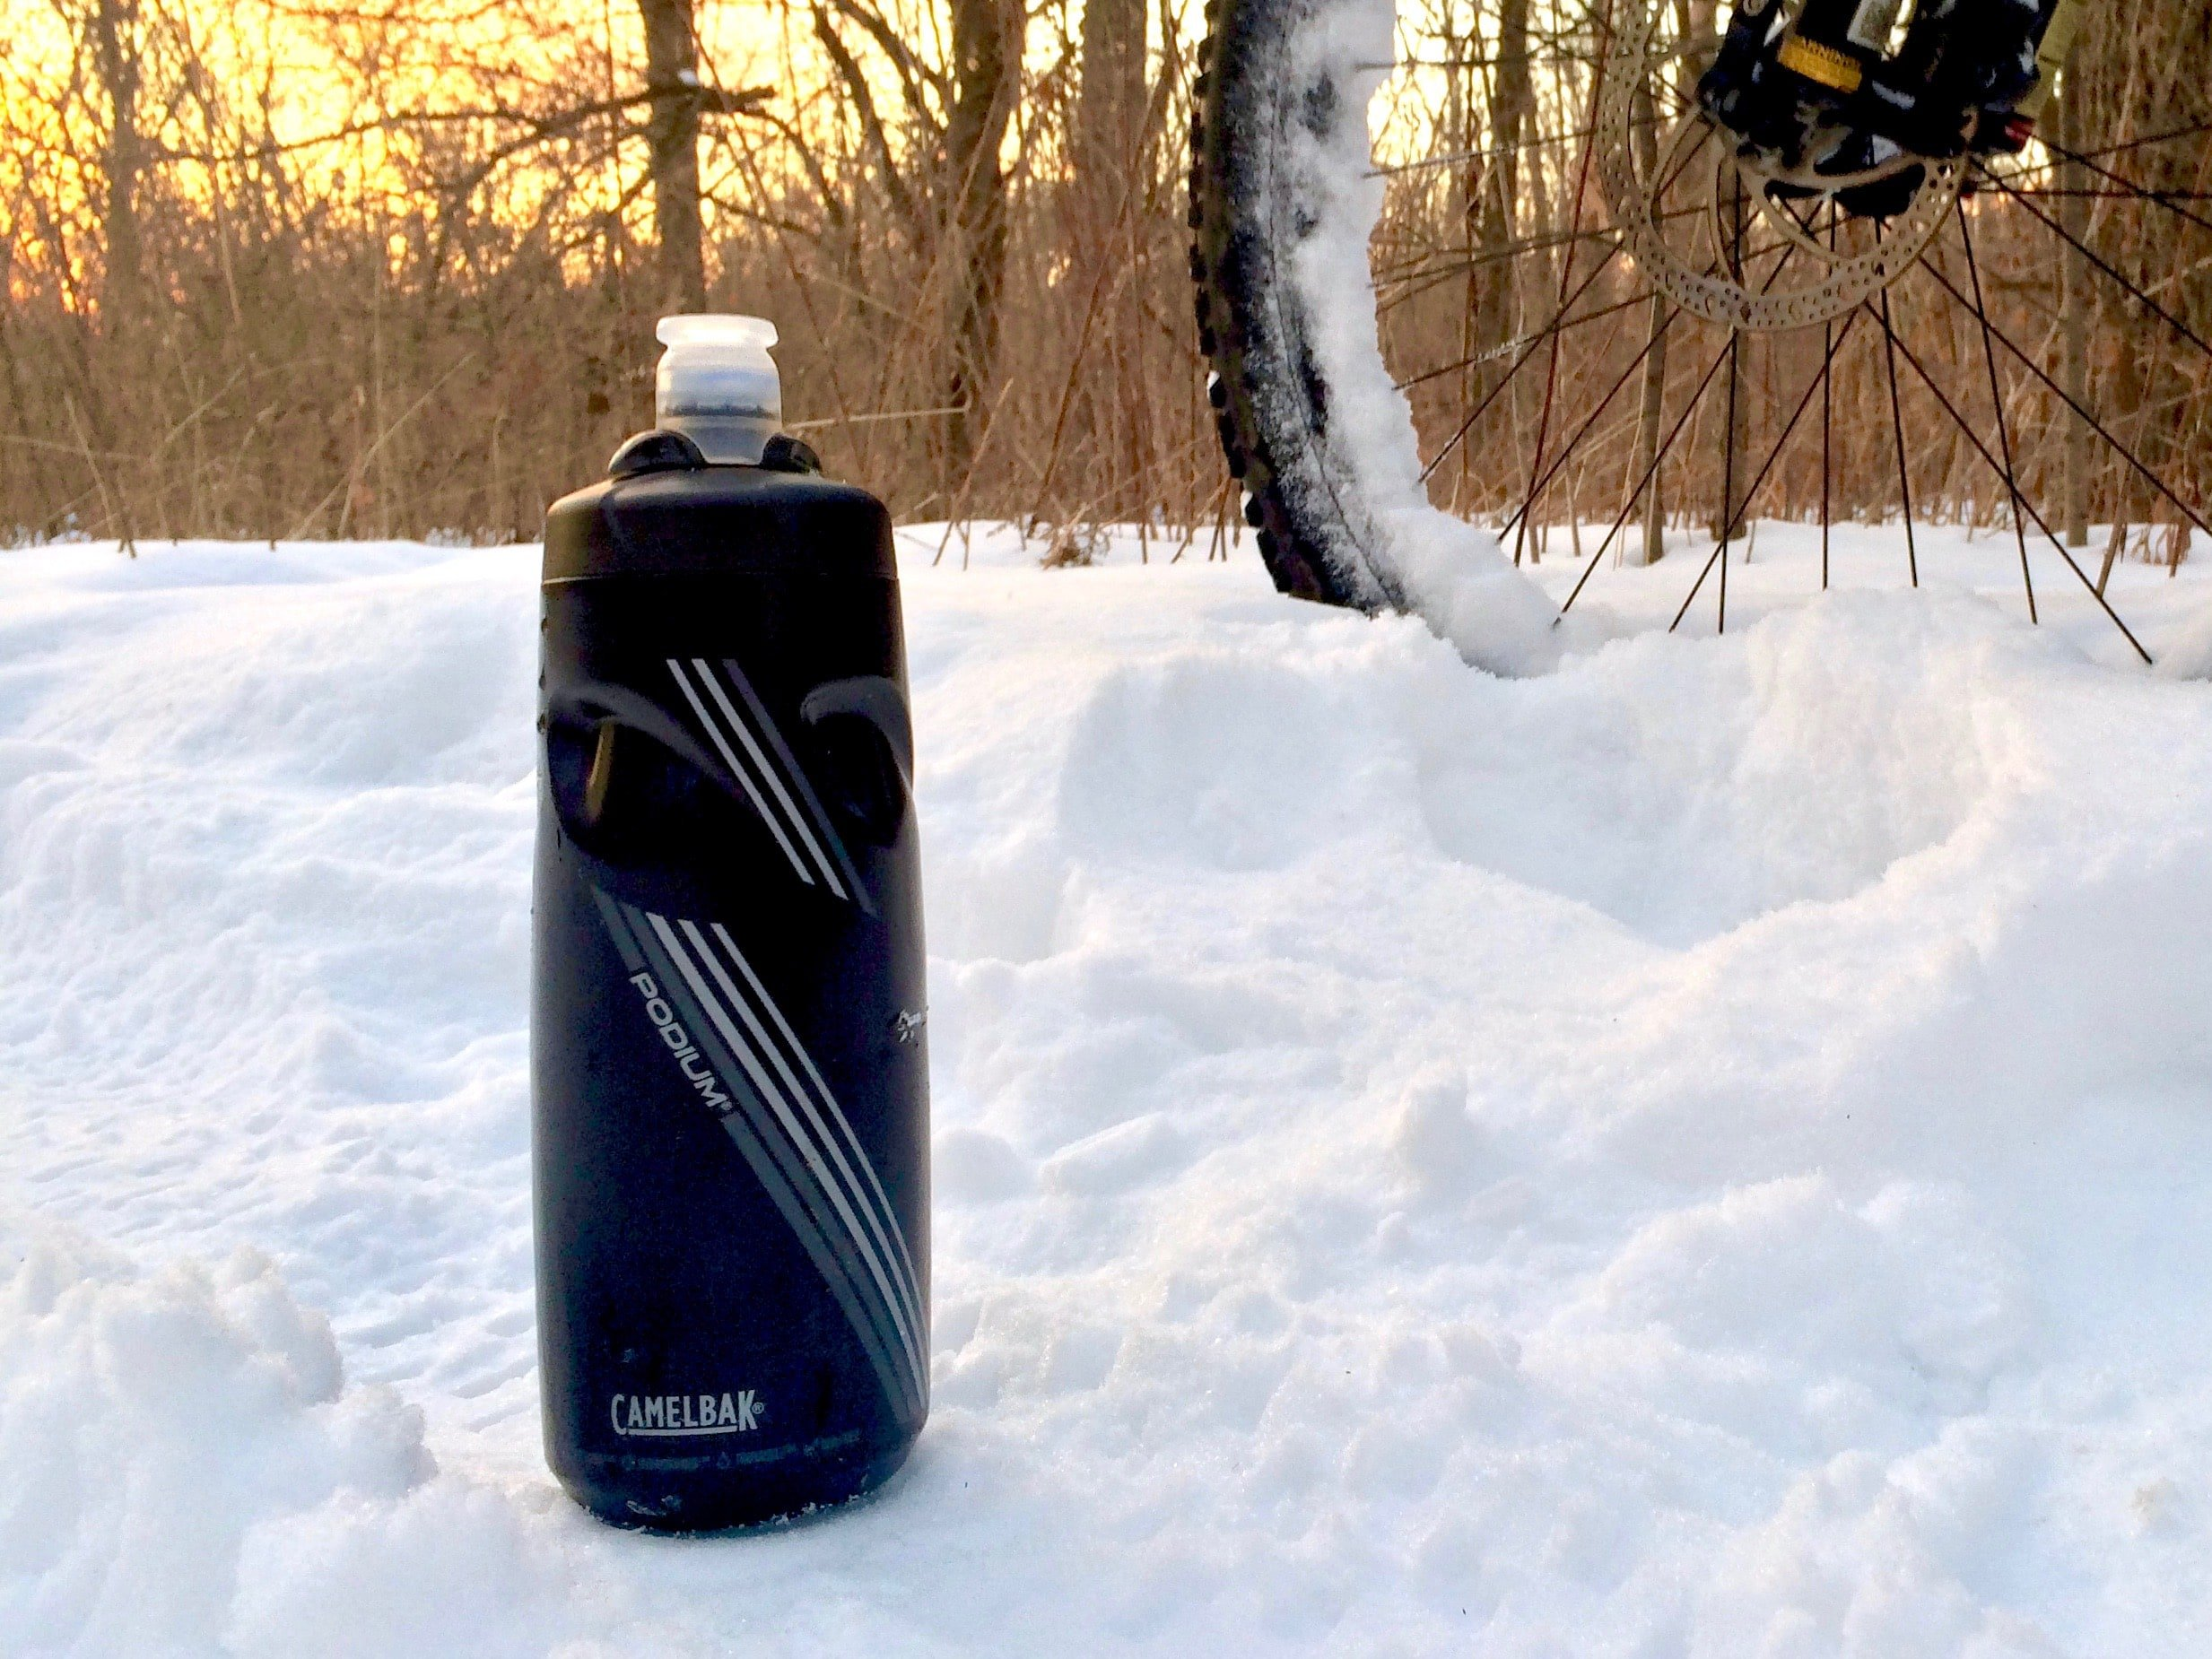 b38f132bcd Camelbak Podium VS a Regular Water Bottle - Everyday MTB